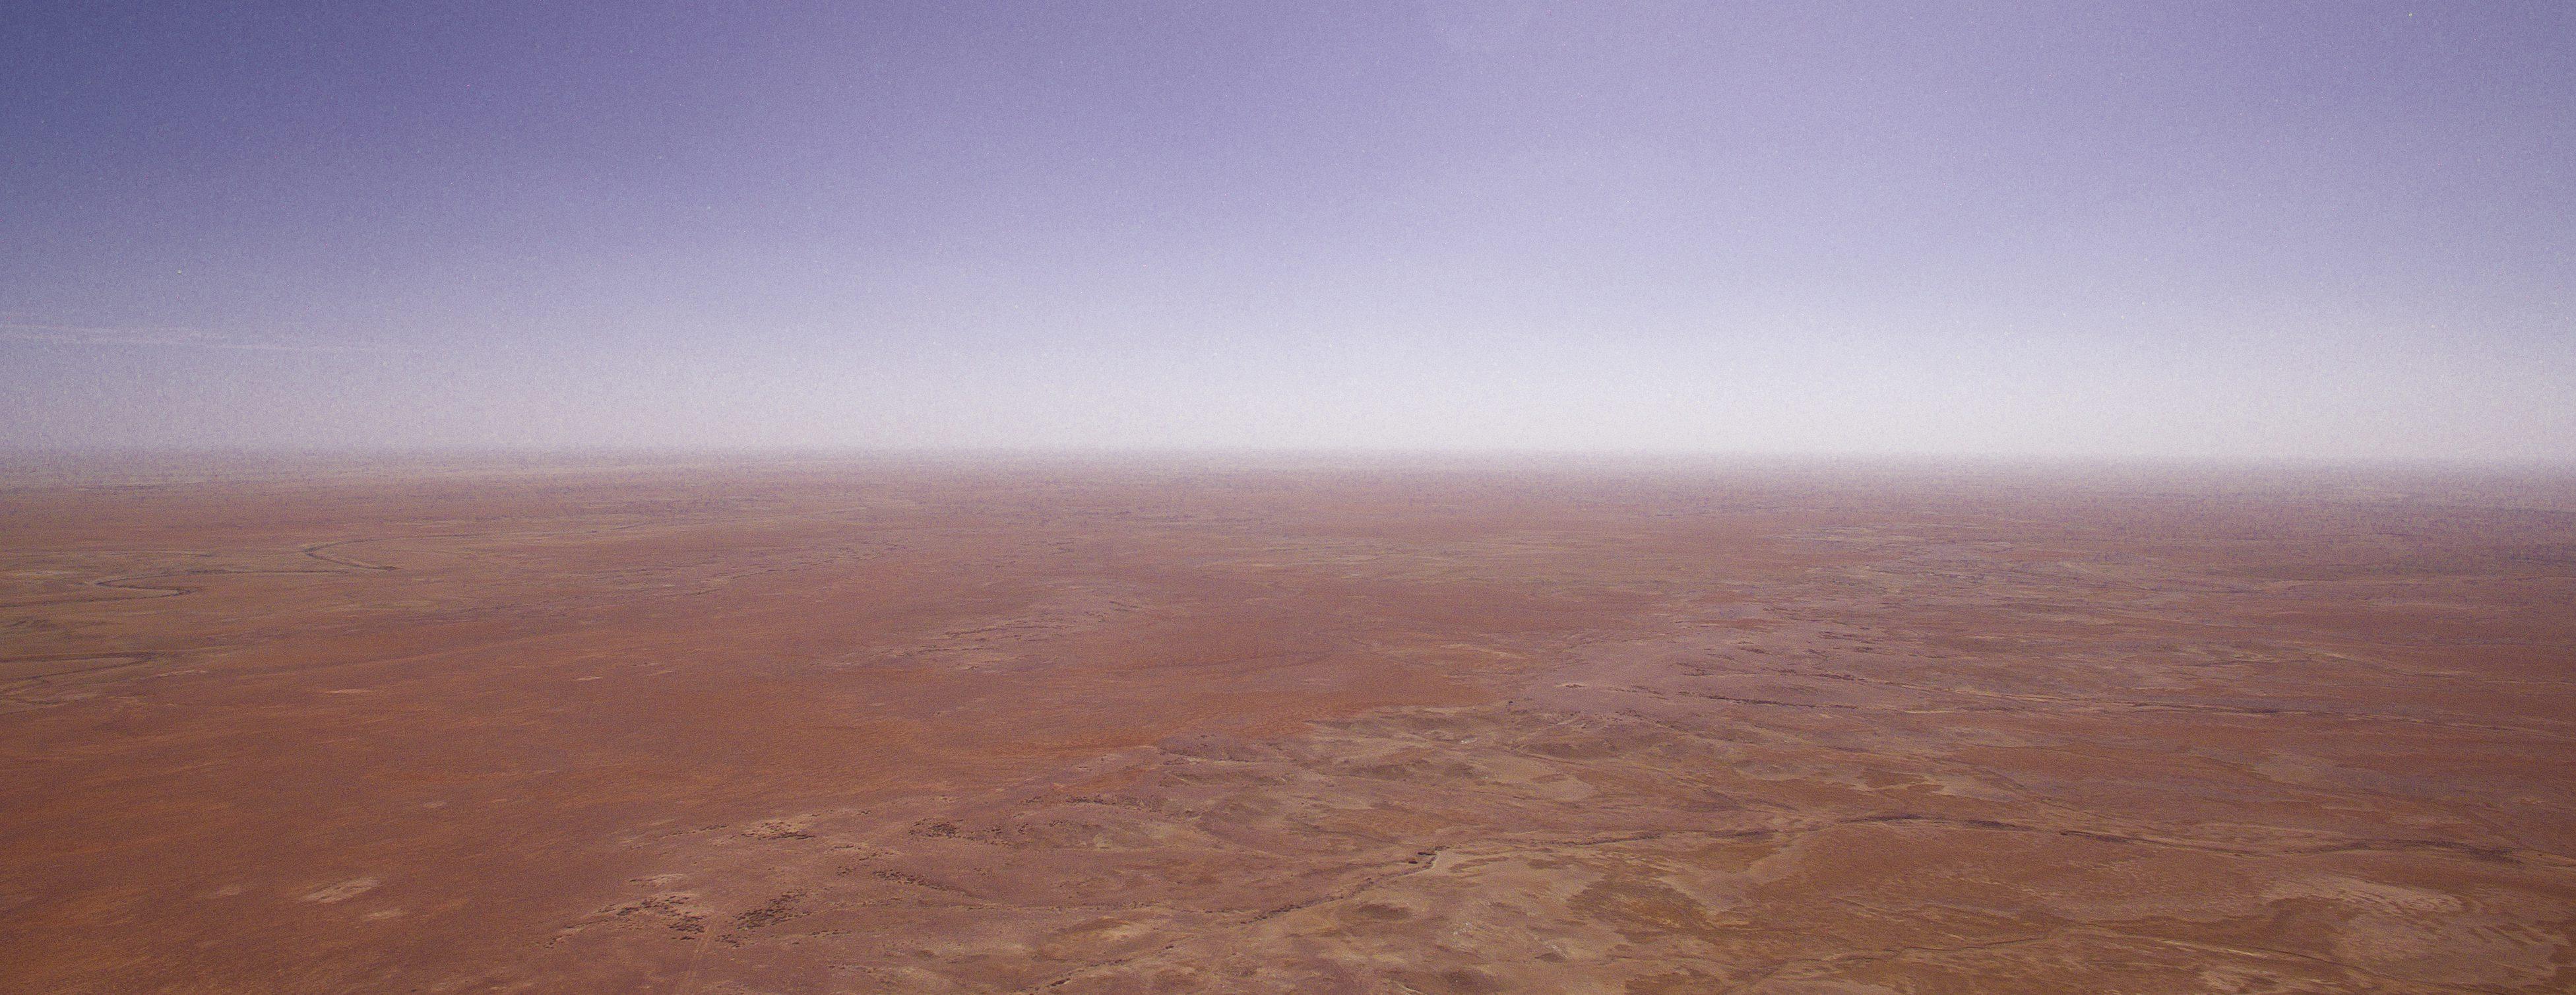 desert drone high site